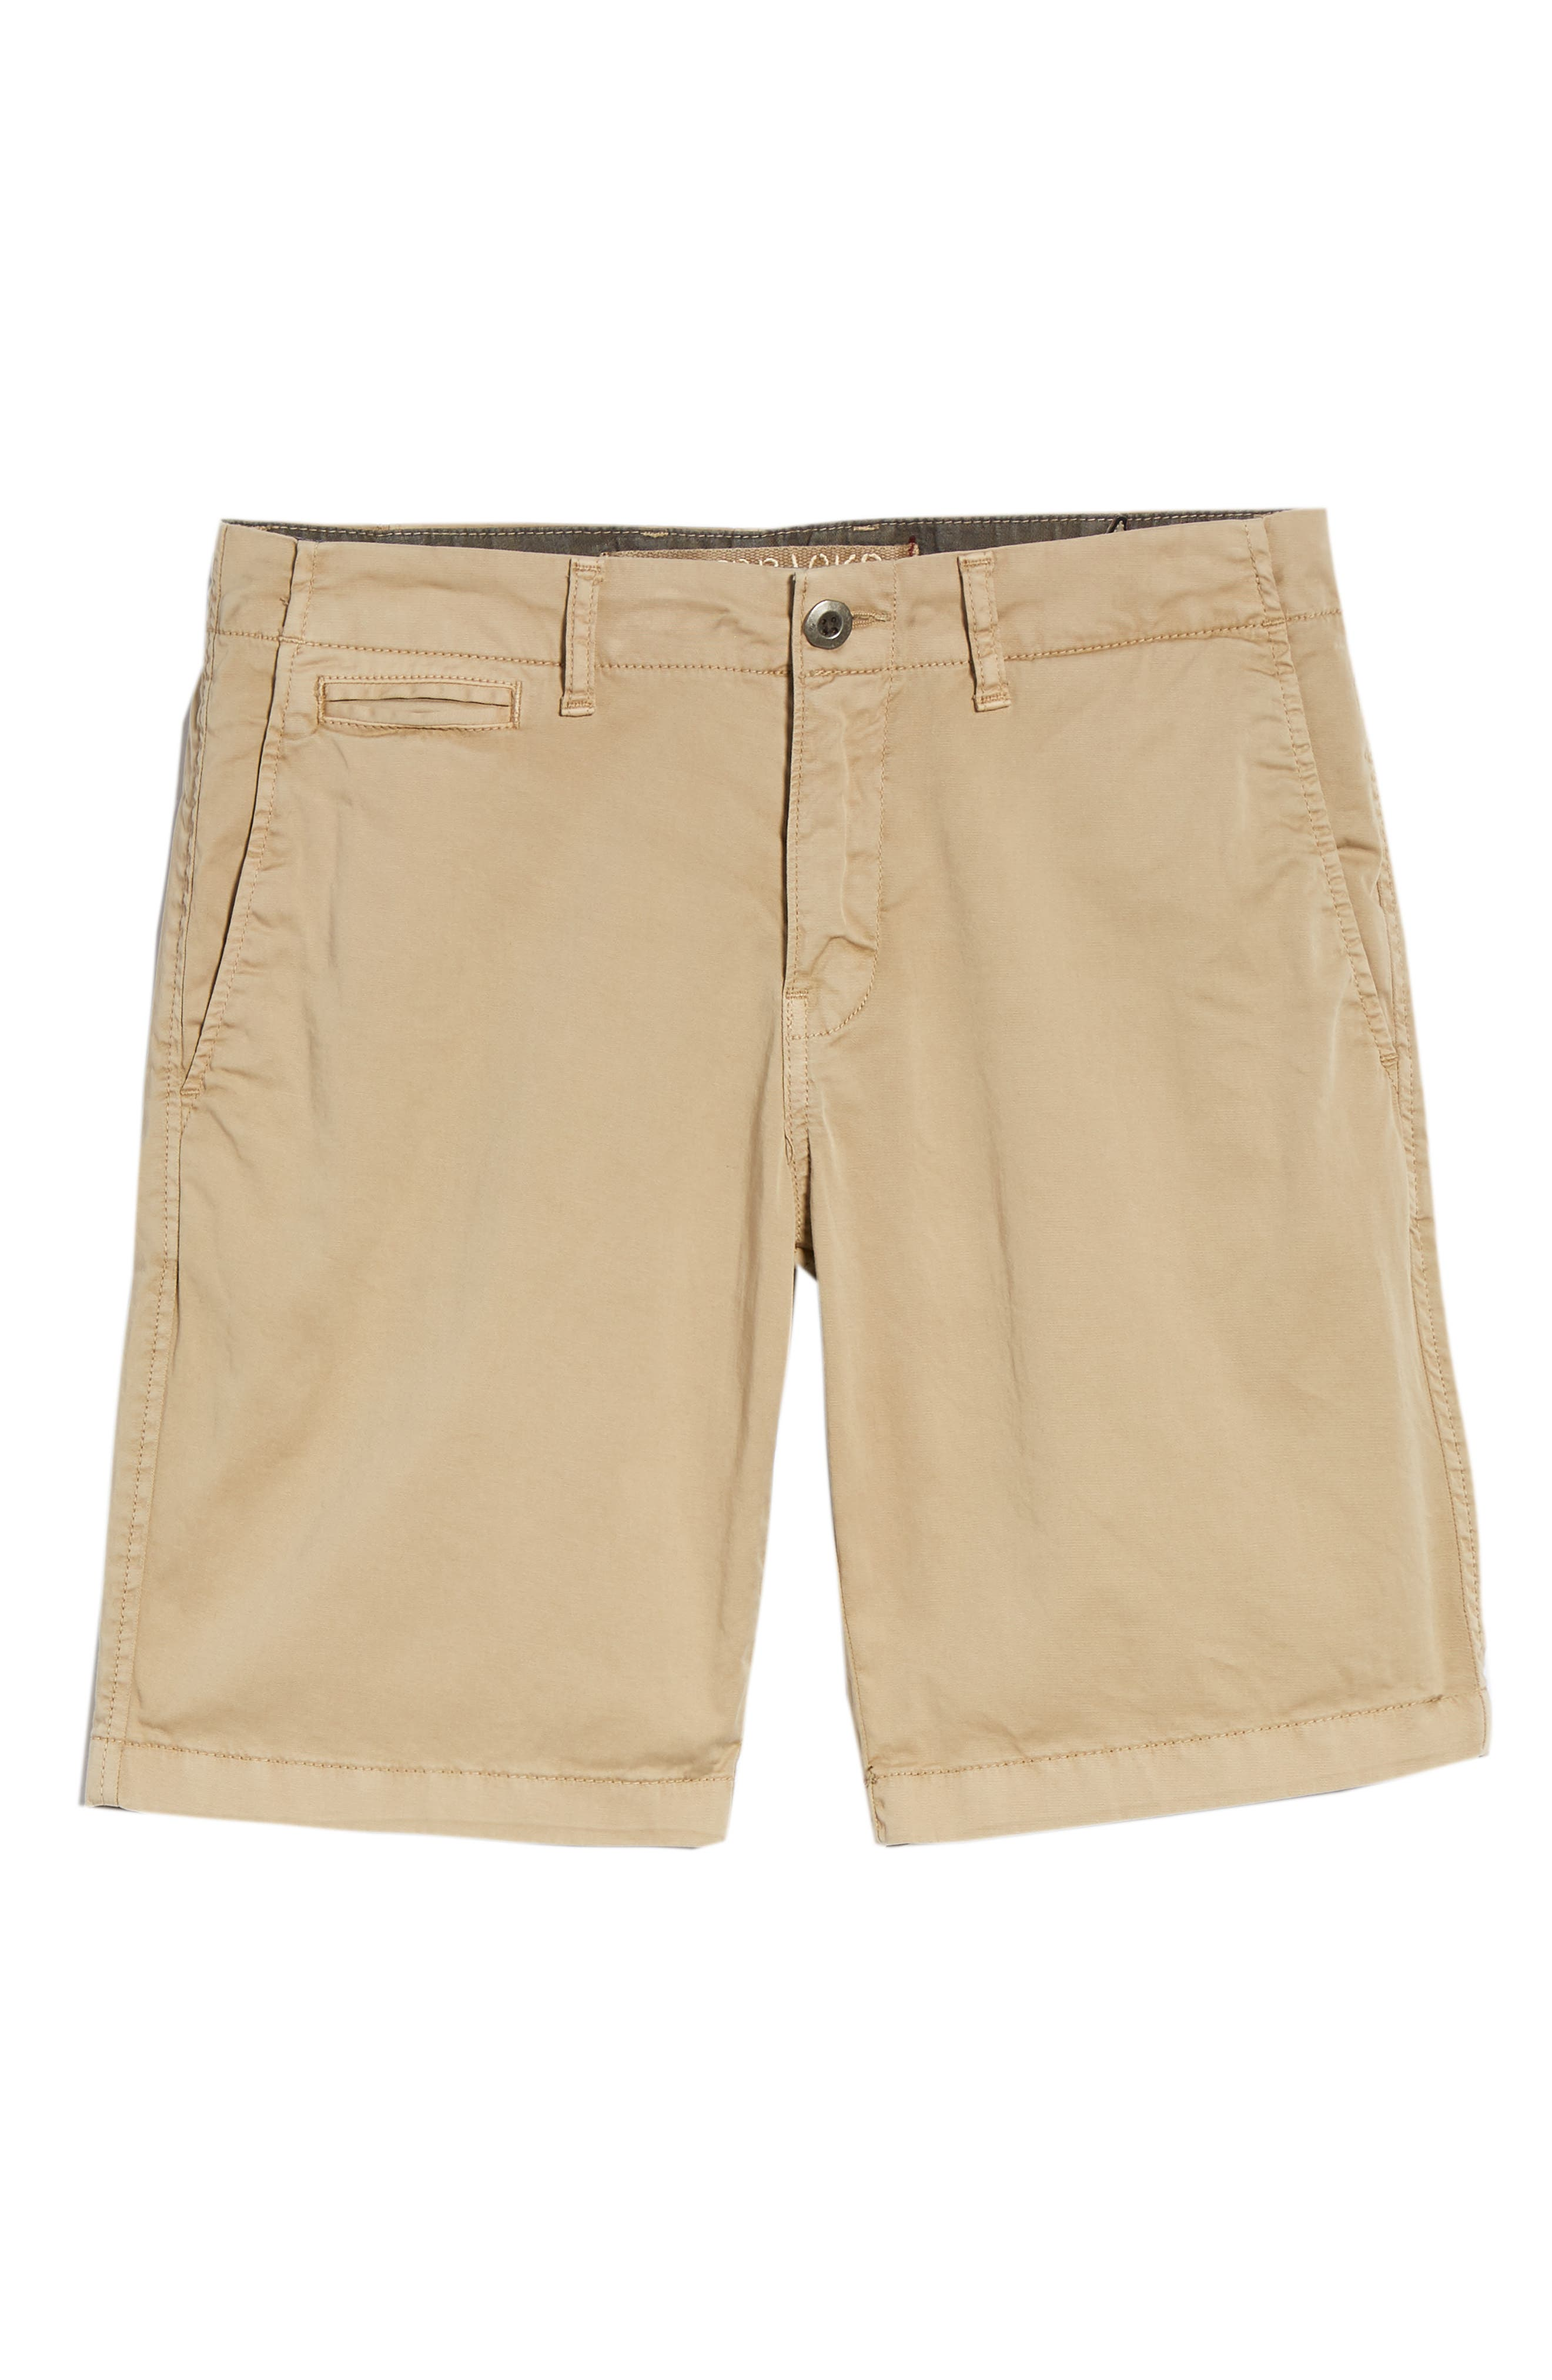 St. Barts Twill Shorts,                             Alternate thumbnail 66, color,